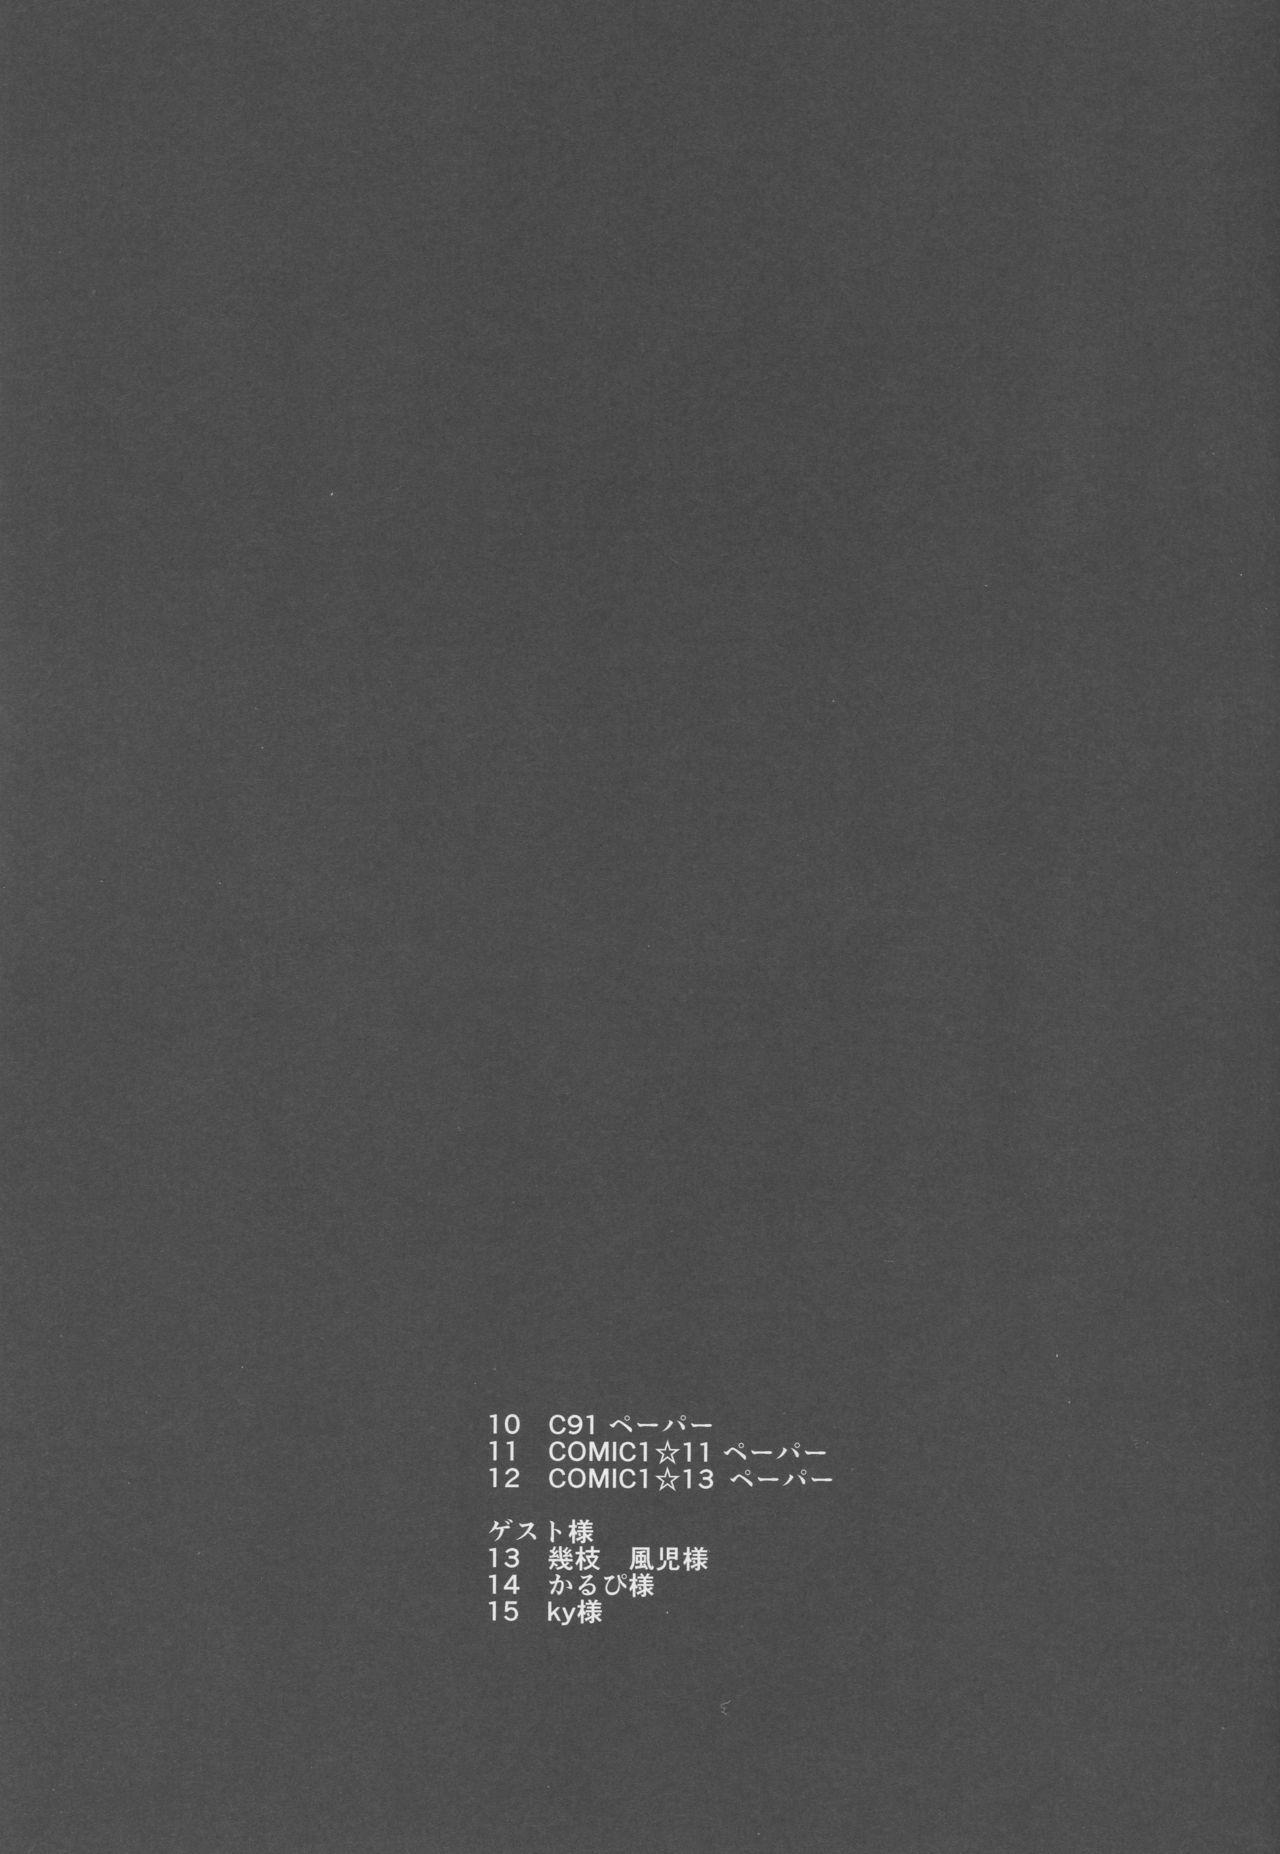 Friend NTR Command Code + Paper Matome 9